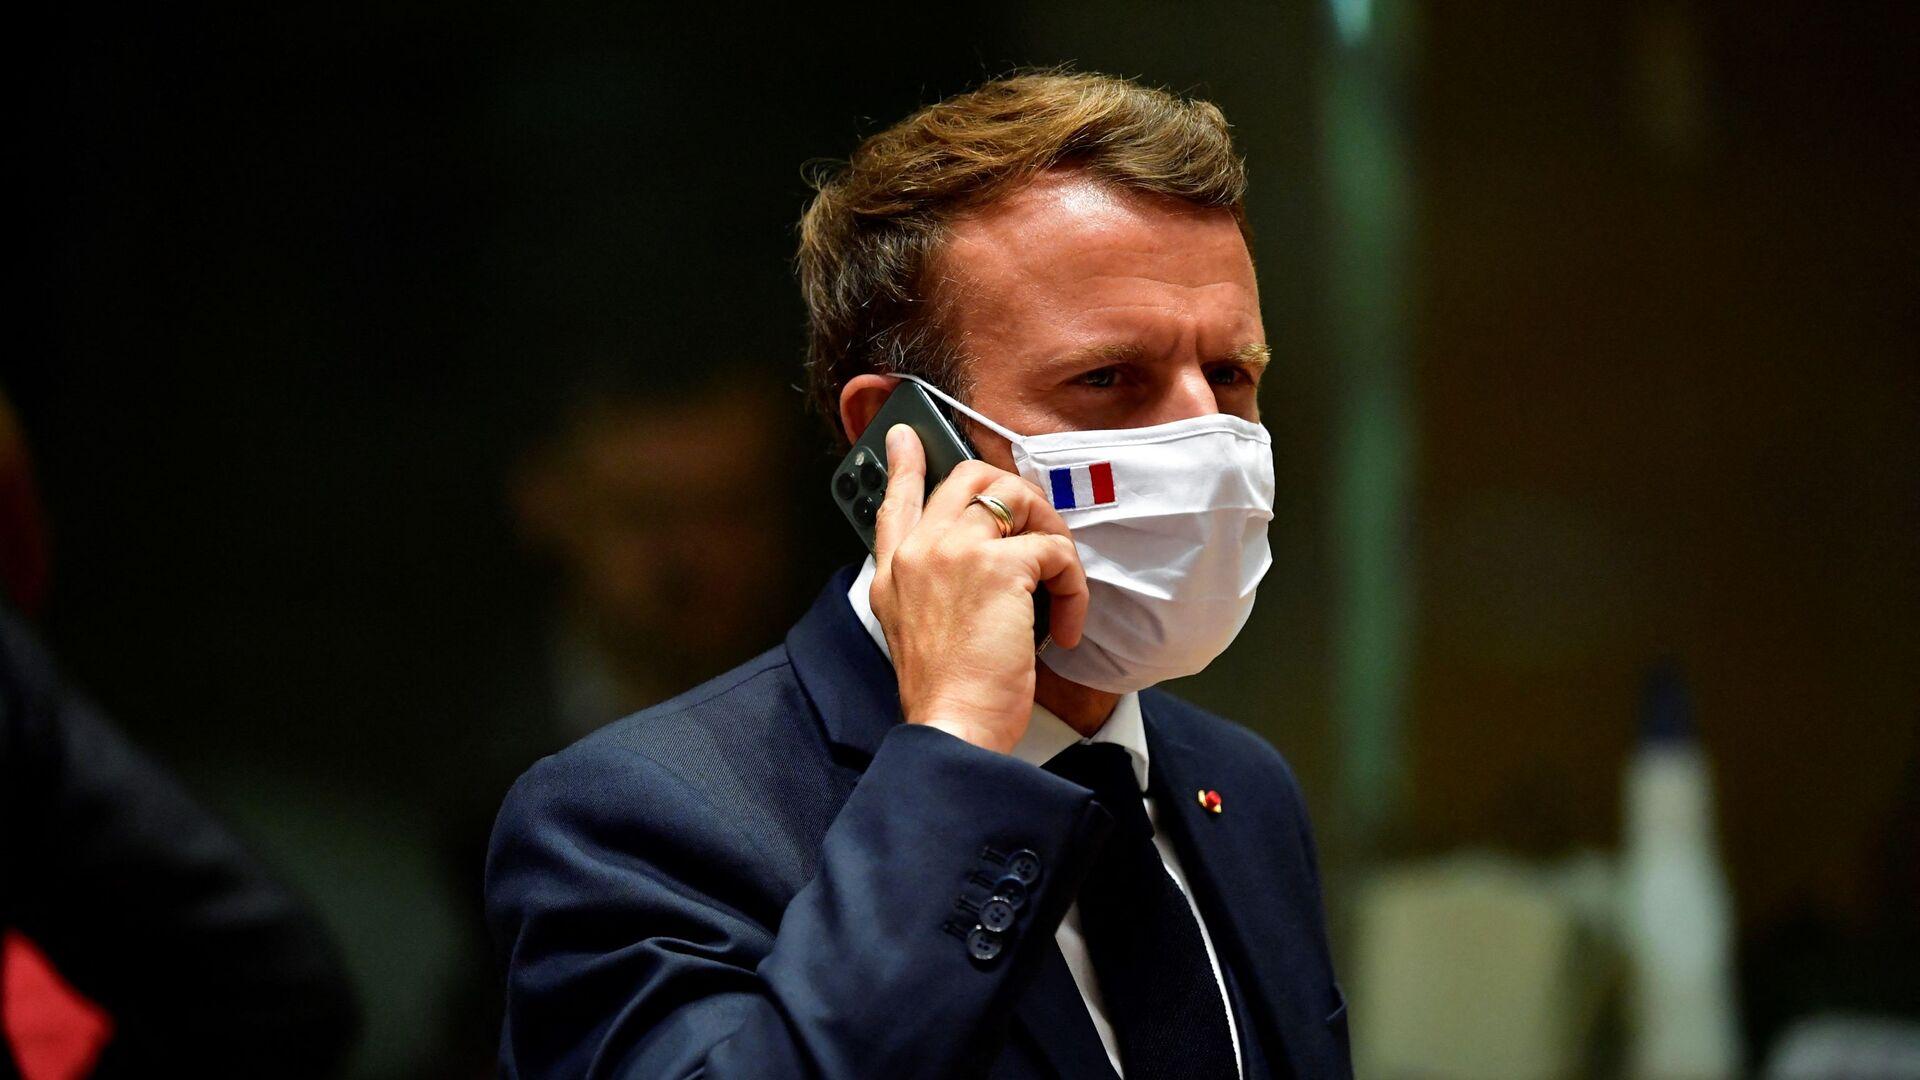 Emmanuel Macron - Sputnik Italia, 1920, 09.08.2021